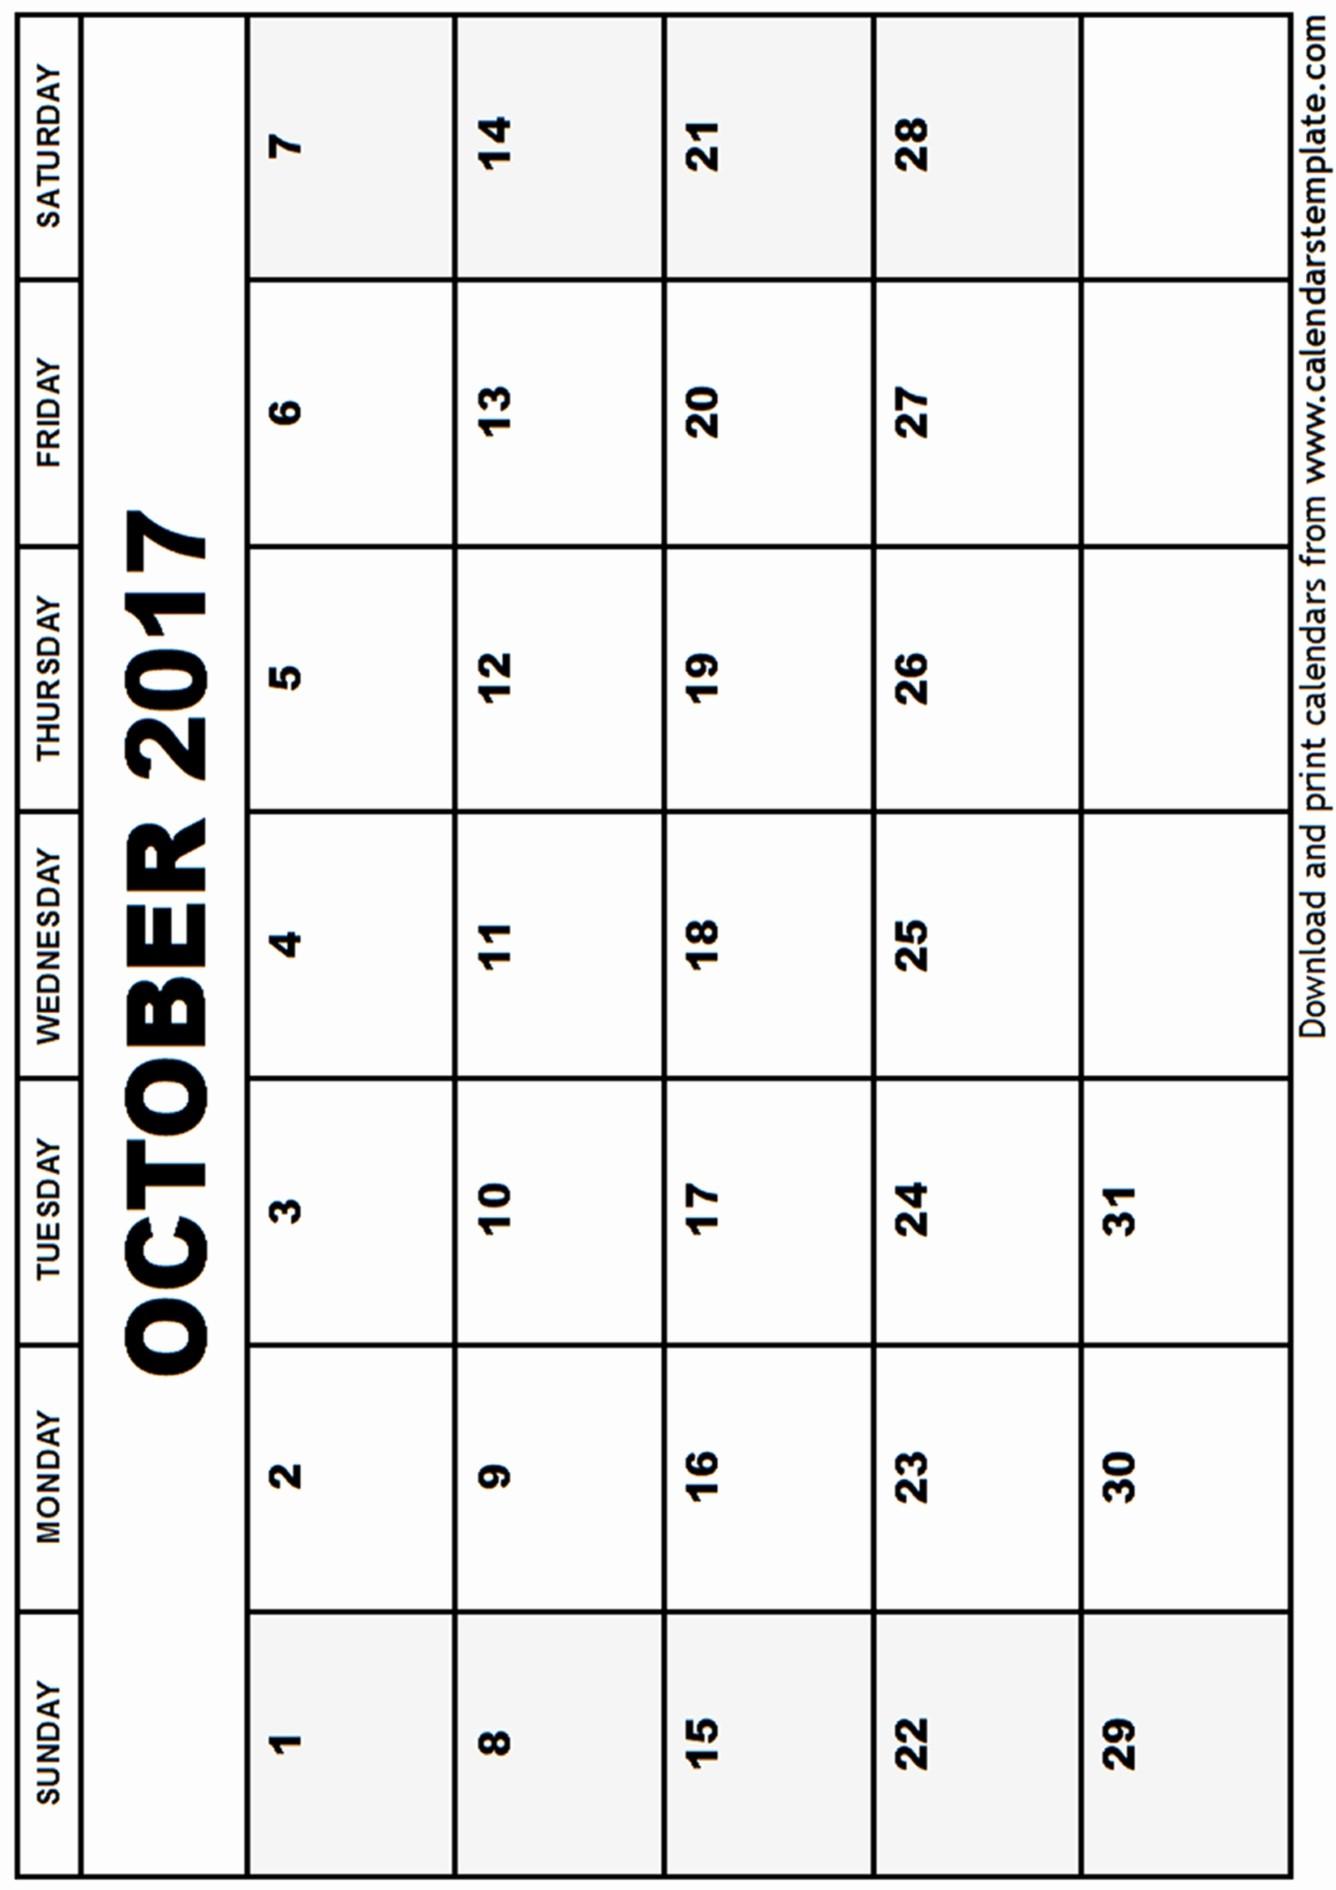 Blank Calendar Template August 2017 Unique October 2017 Calendar Template